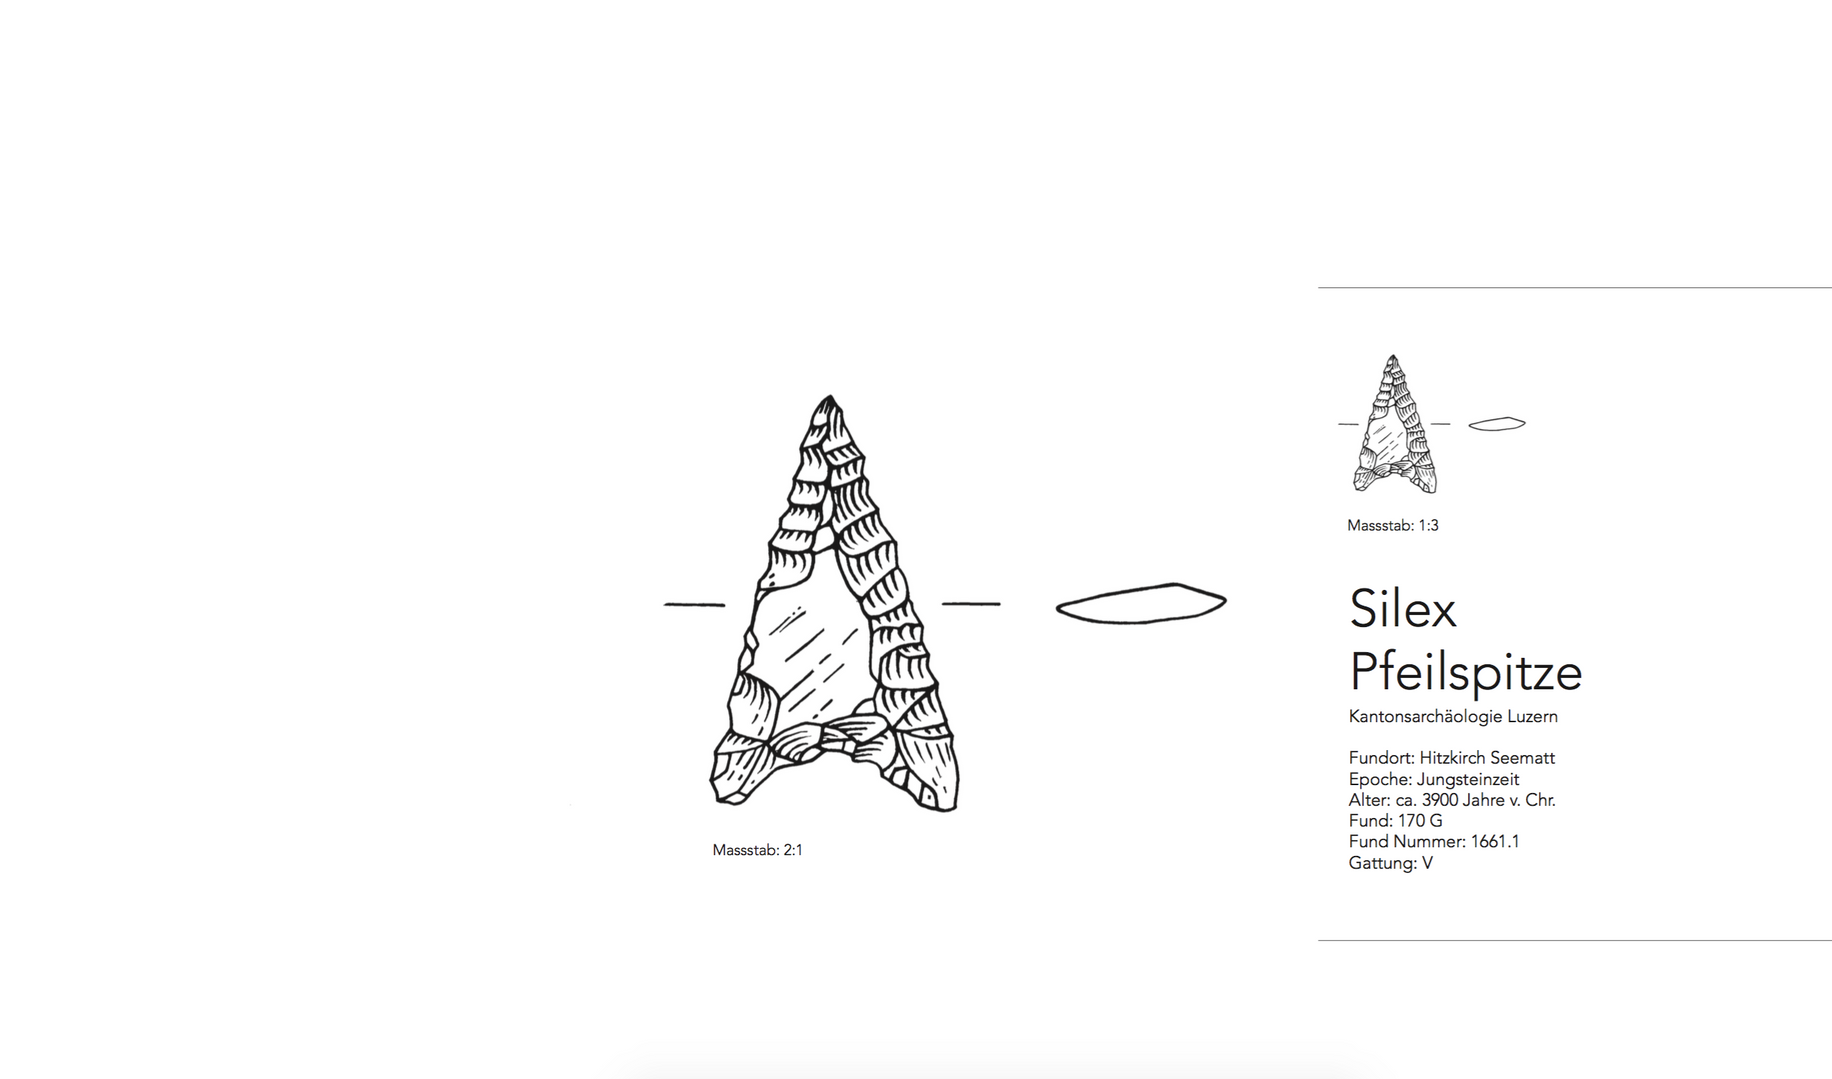 Silex.png